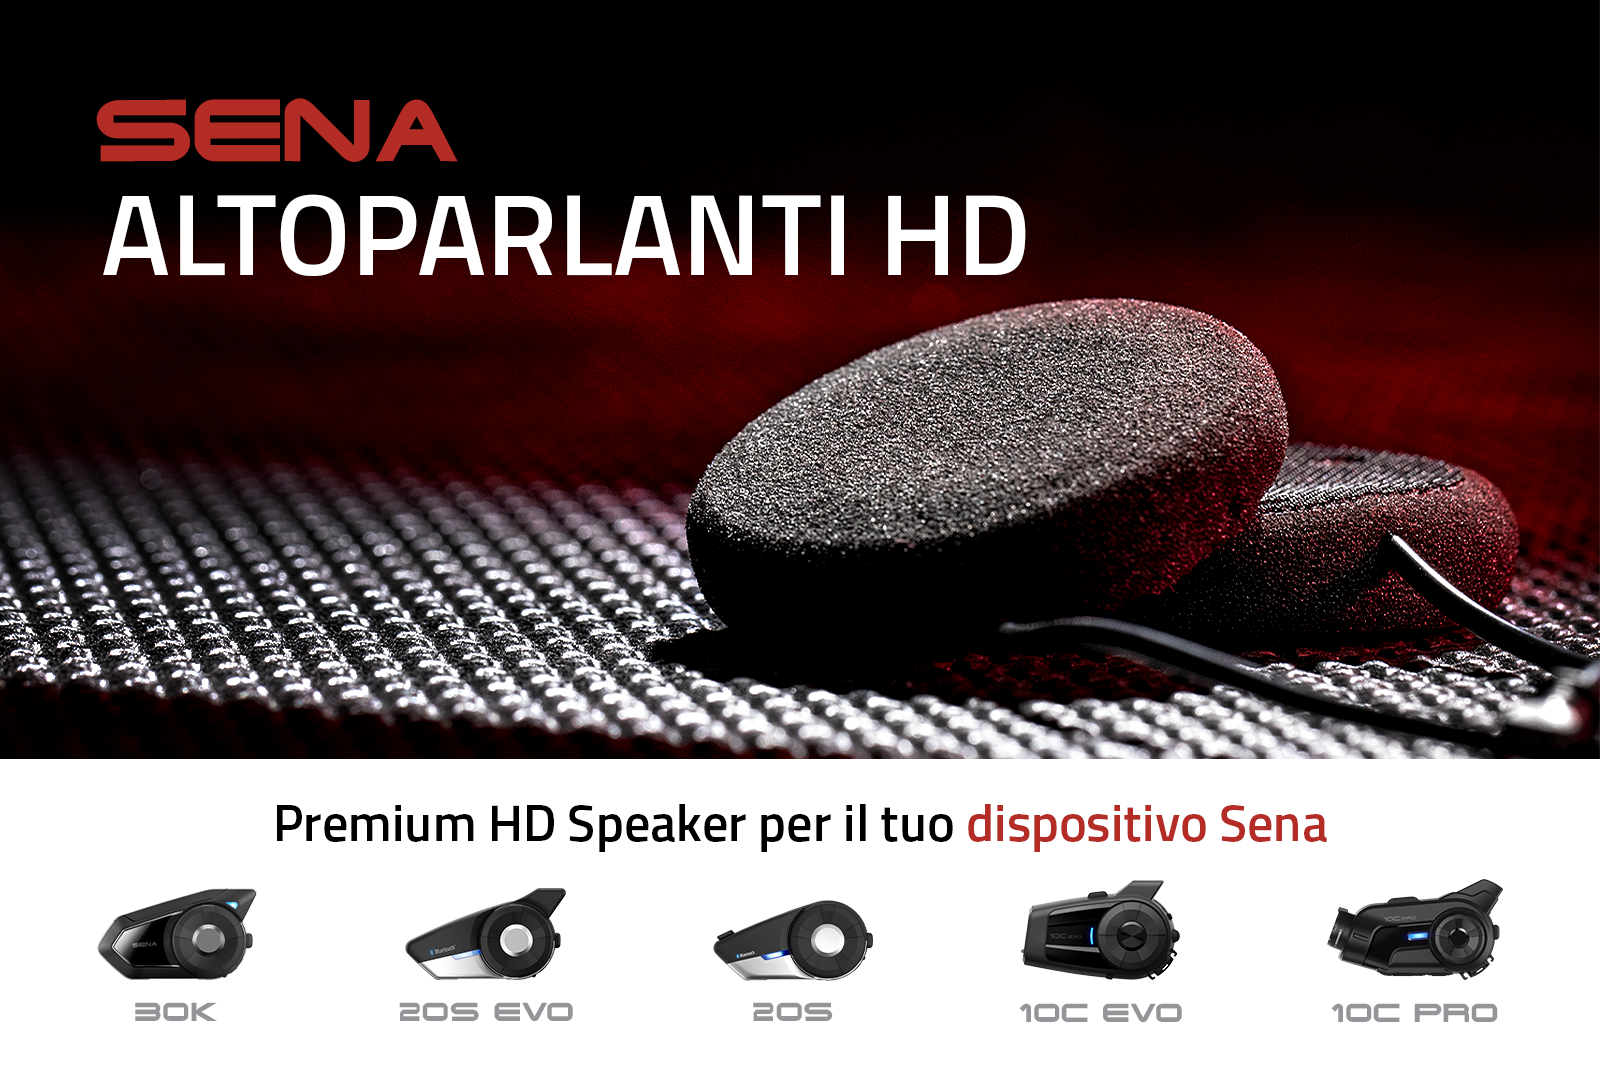 Sena-HD-Speakers-Announcement_Press-Release-IT